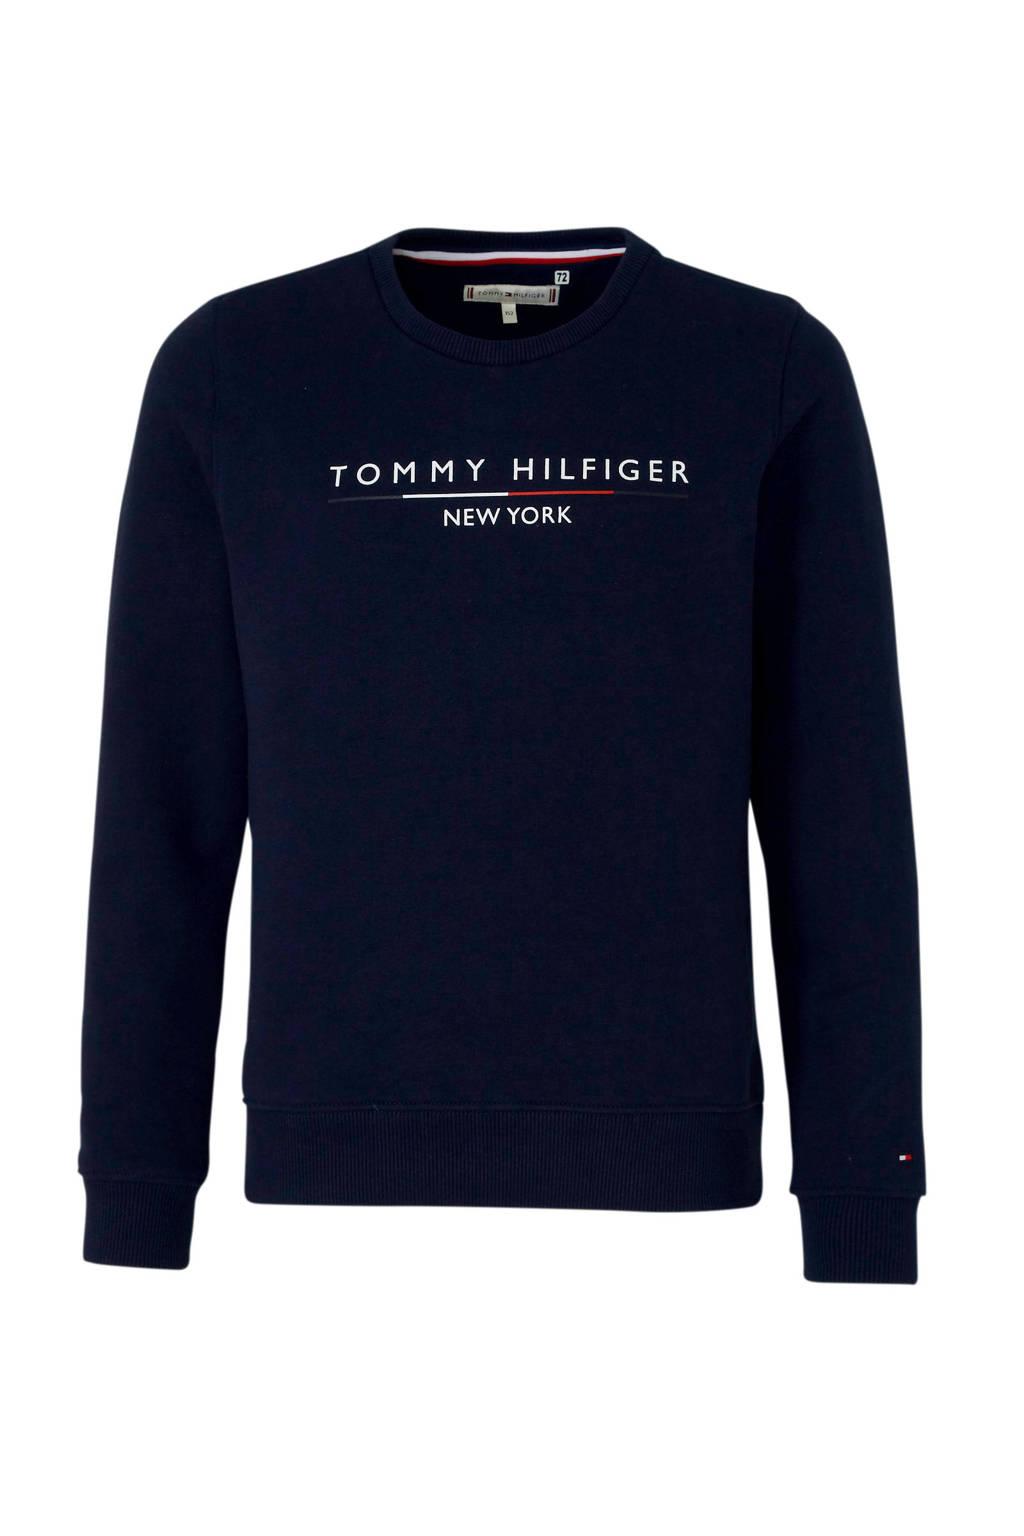 Tommy Hilfiger sweater met logo donkerblauw, Donkerblauw